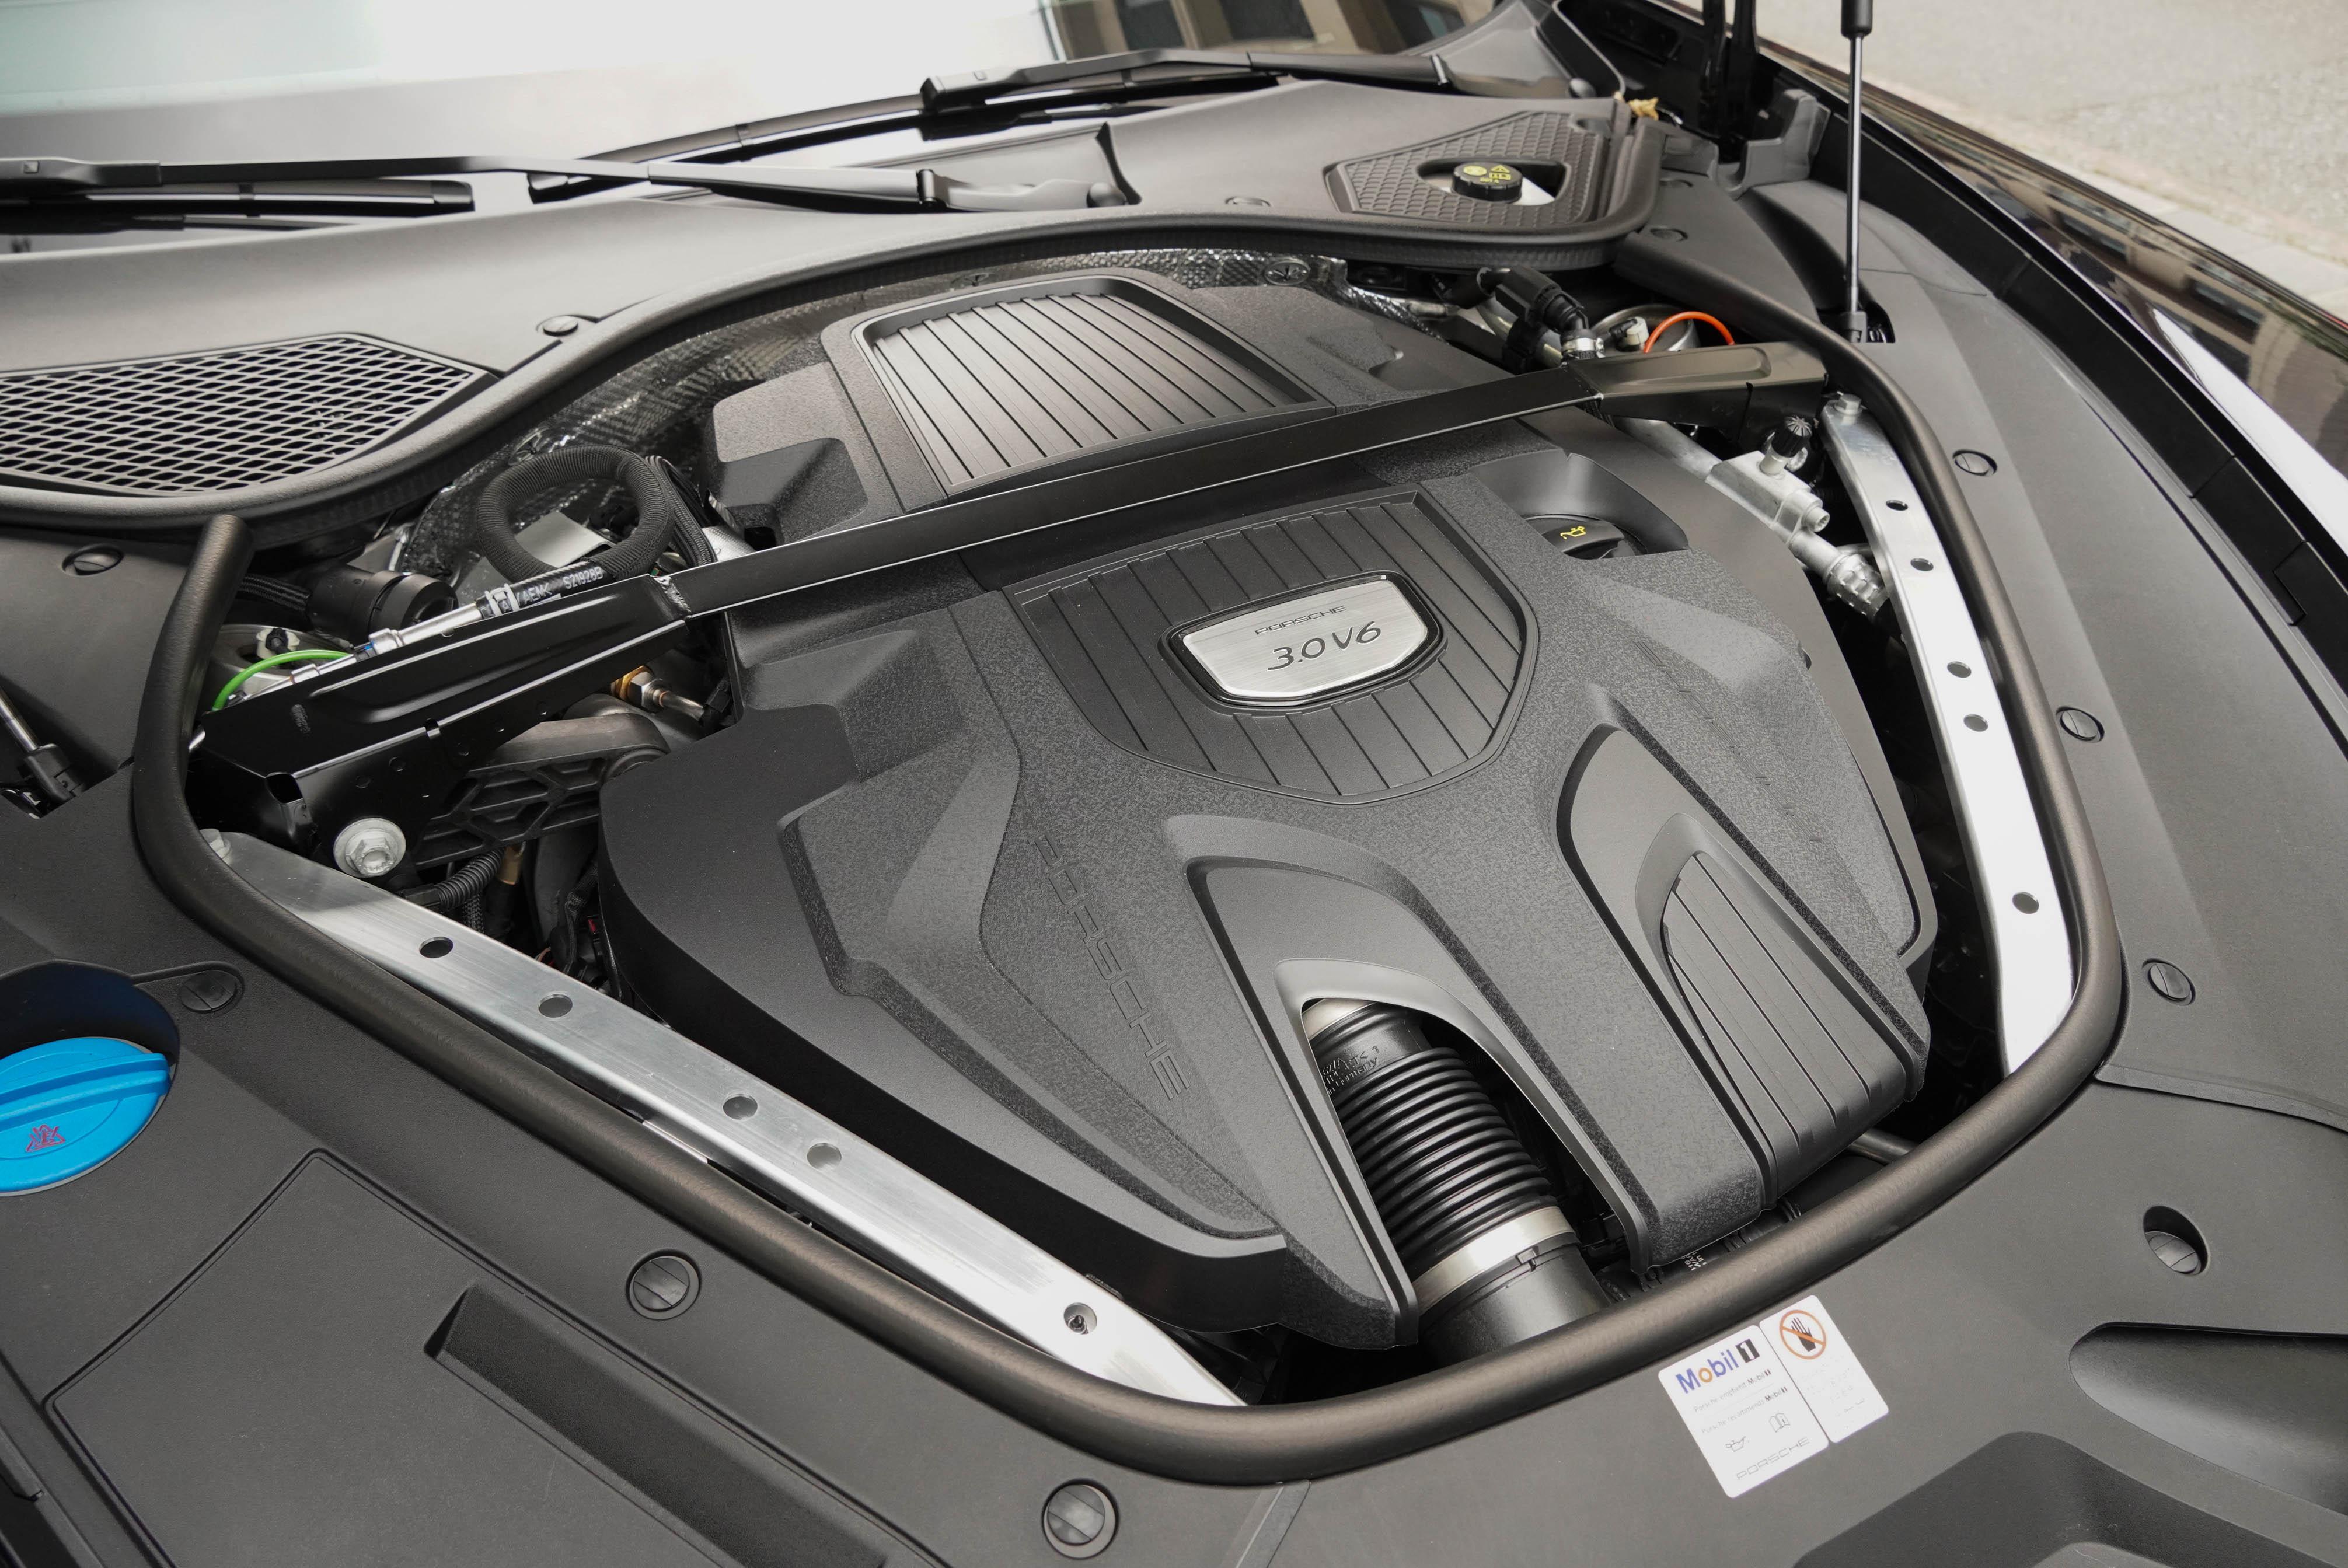 V6 渦輪增壓引擎可輸出 330 ps、450 Nm 動力,0-100 km/h 加速可於 5.7 秒完成。